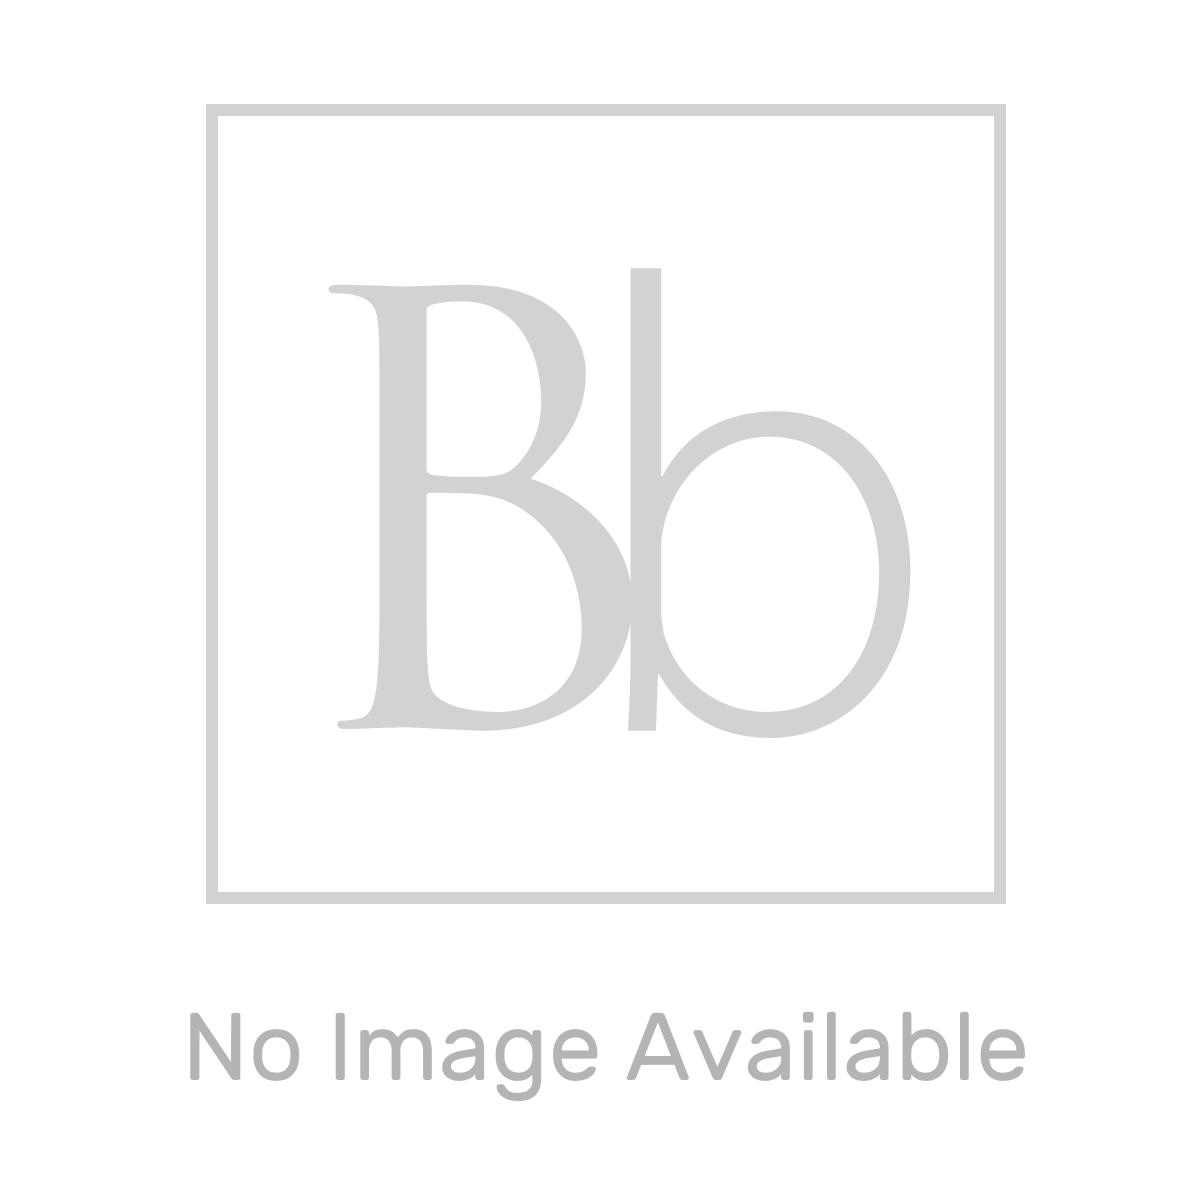 Premier High Gloss White Bathroom Mirror and Light 650mm